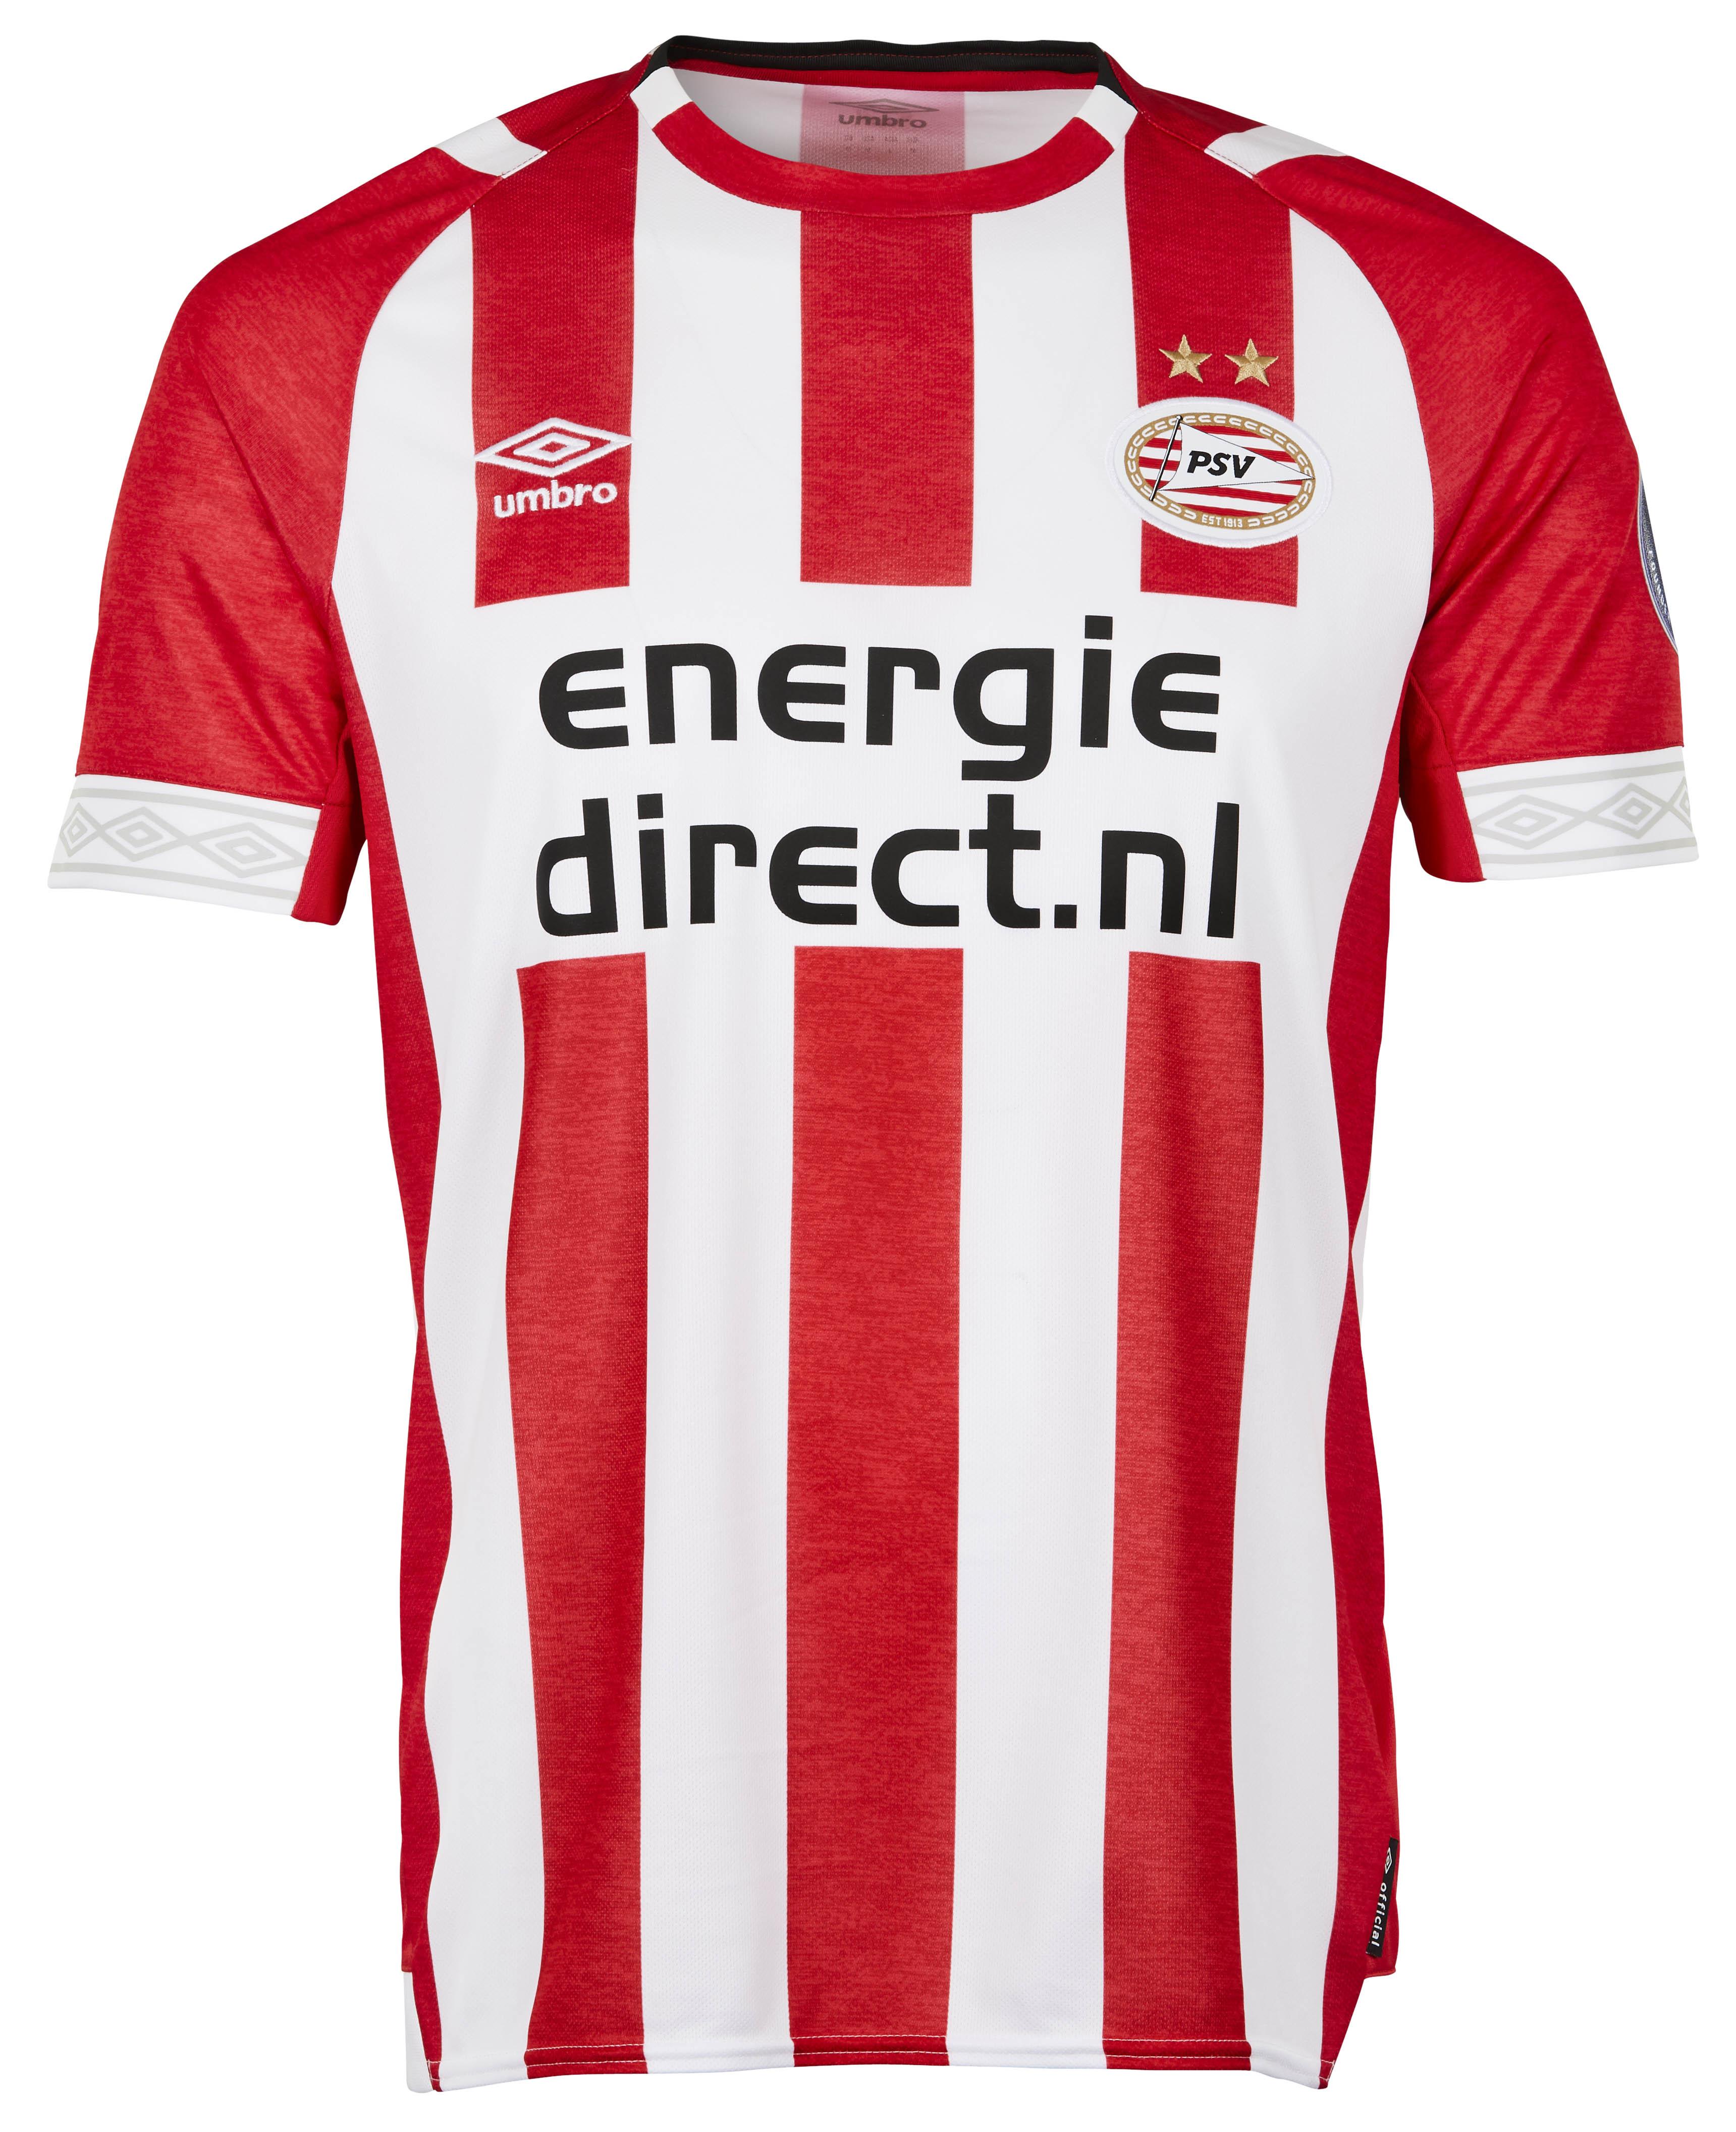 7ac2b2f6e0d PSV Eindhoven Jersey 2018-19